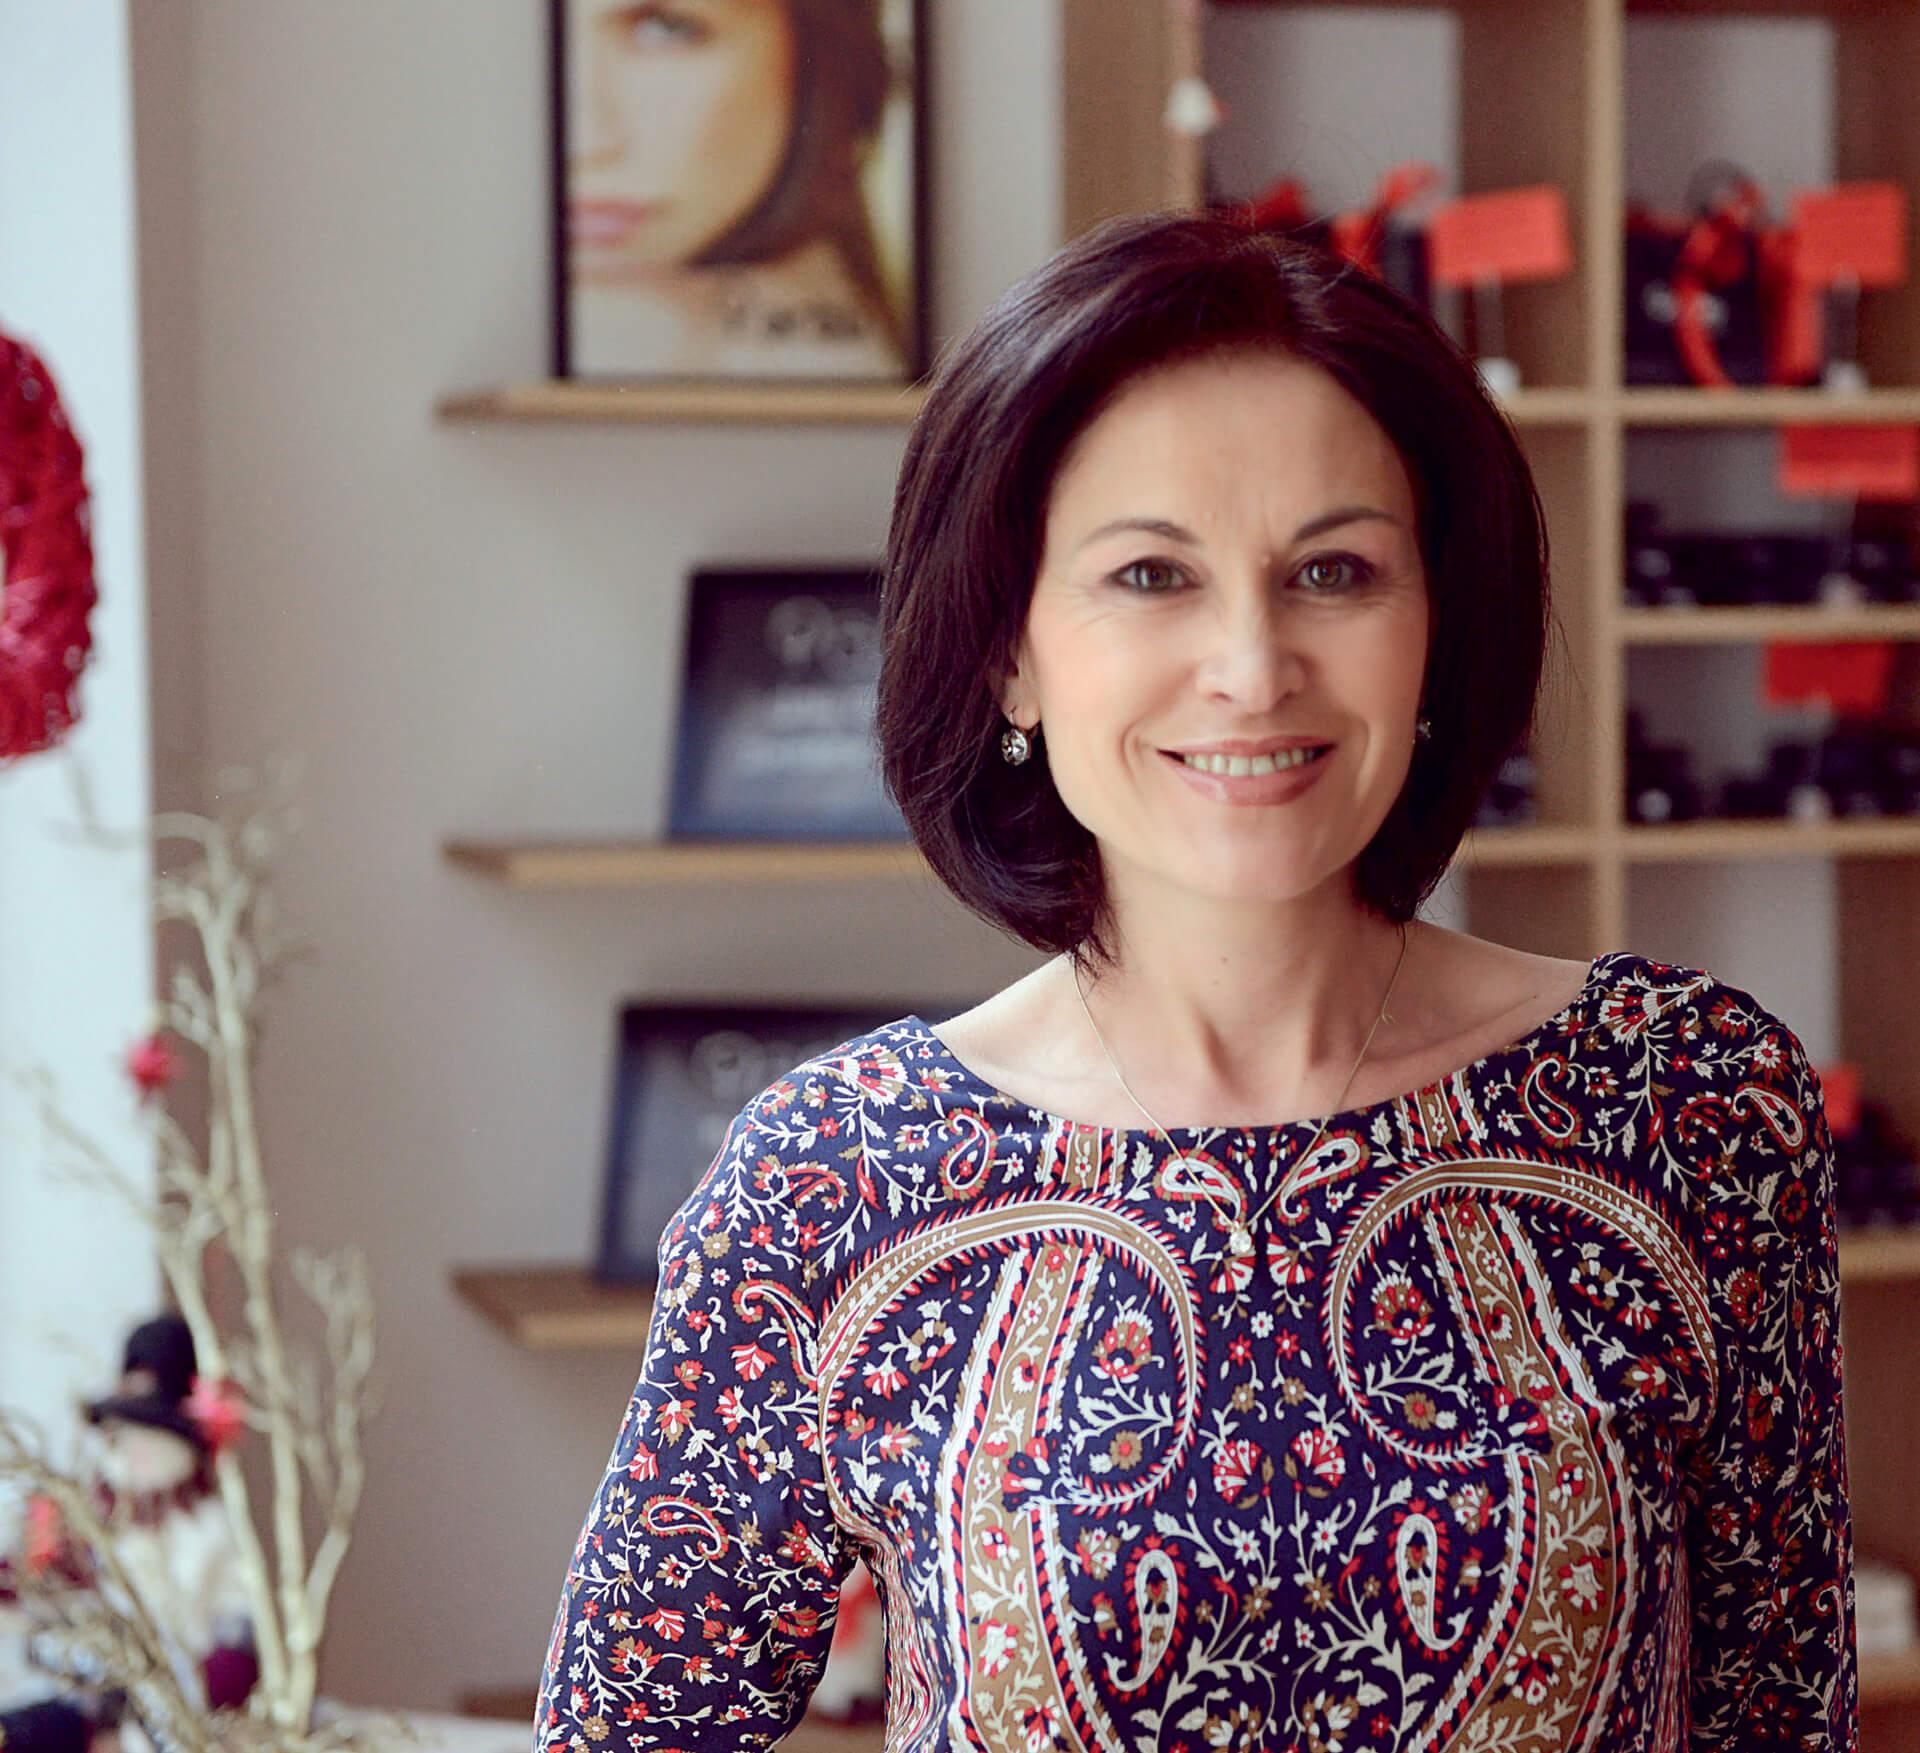 Violeta Malinova, clean beauty pioneer and arbū founder and CEO